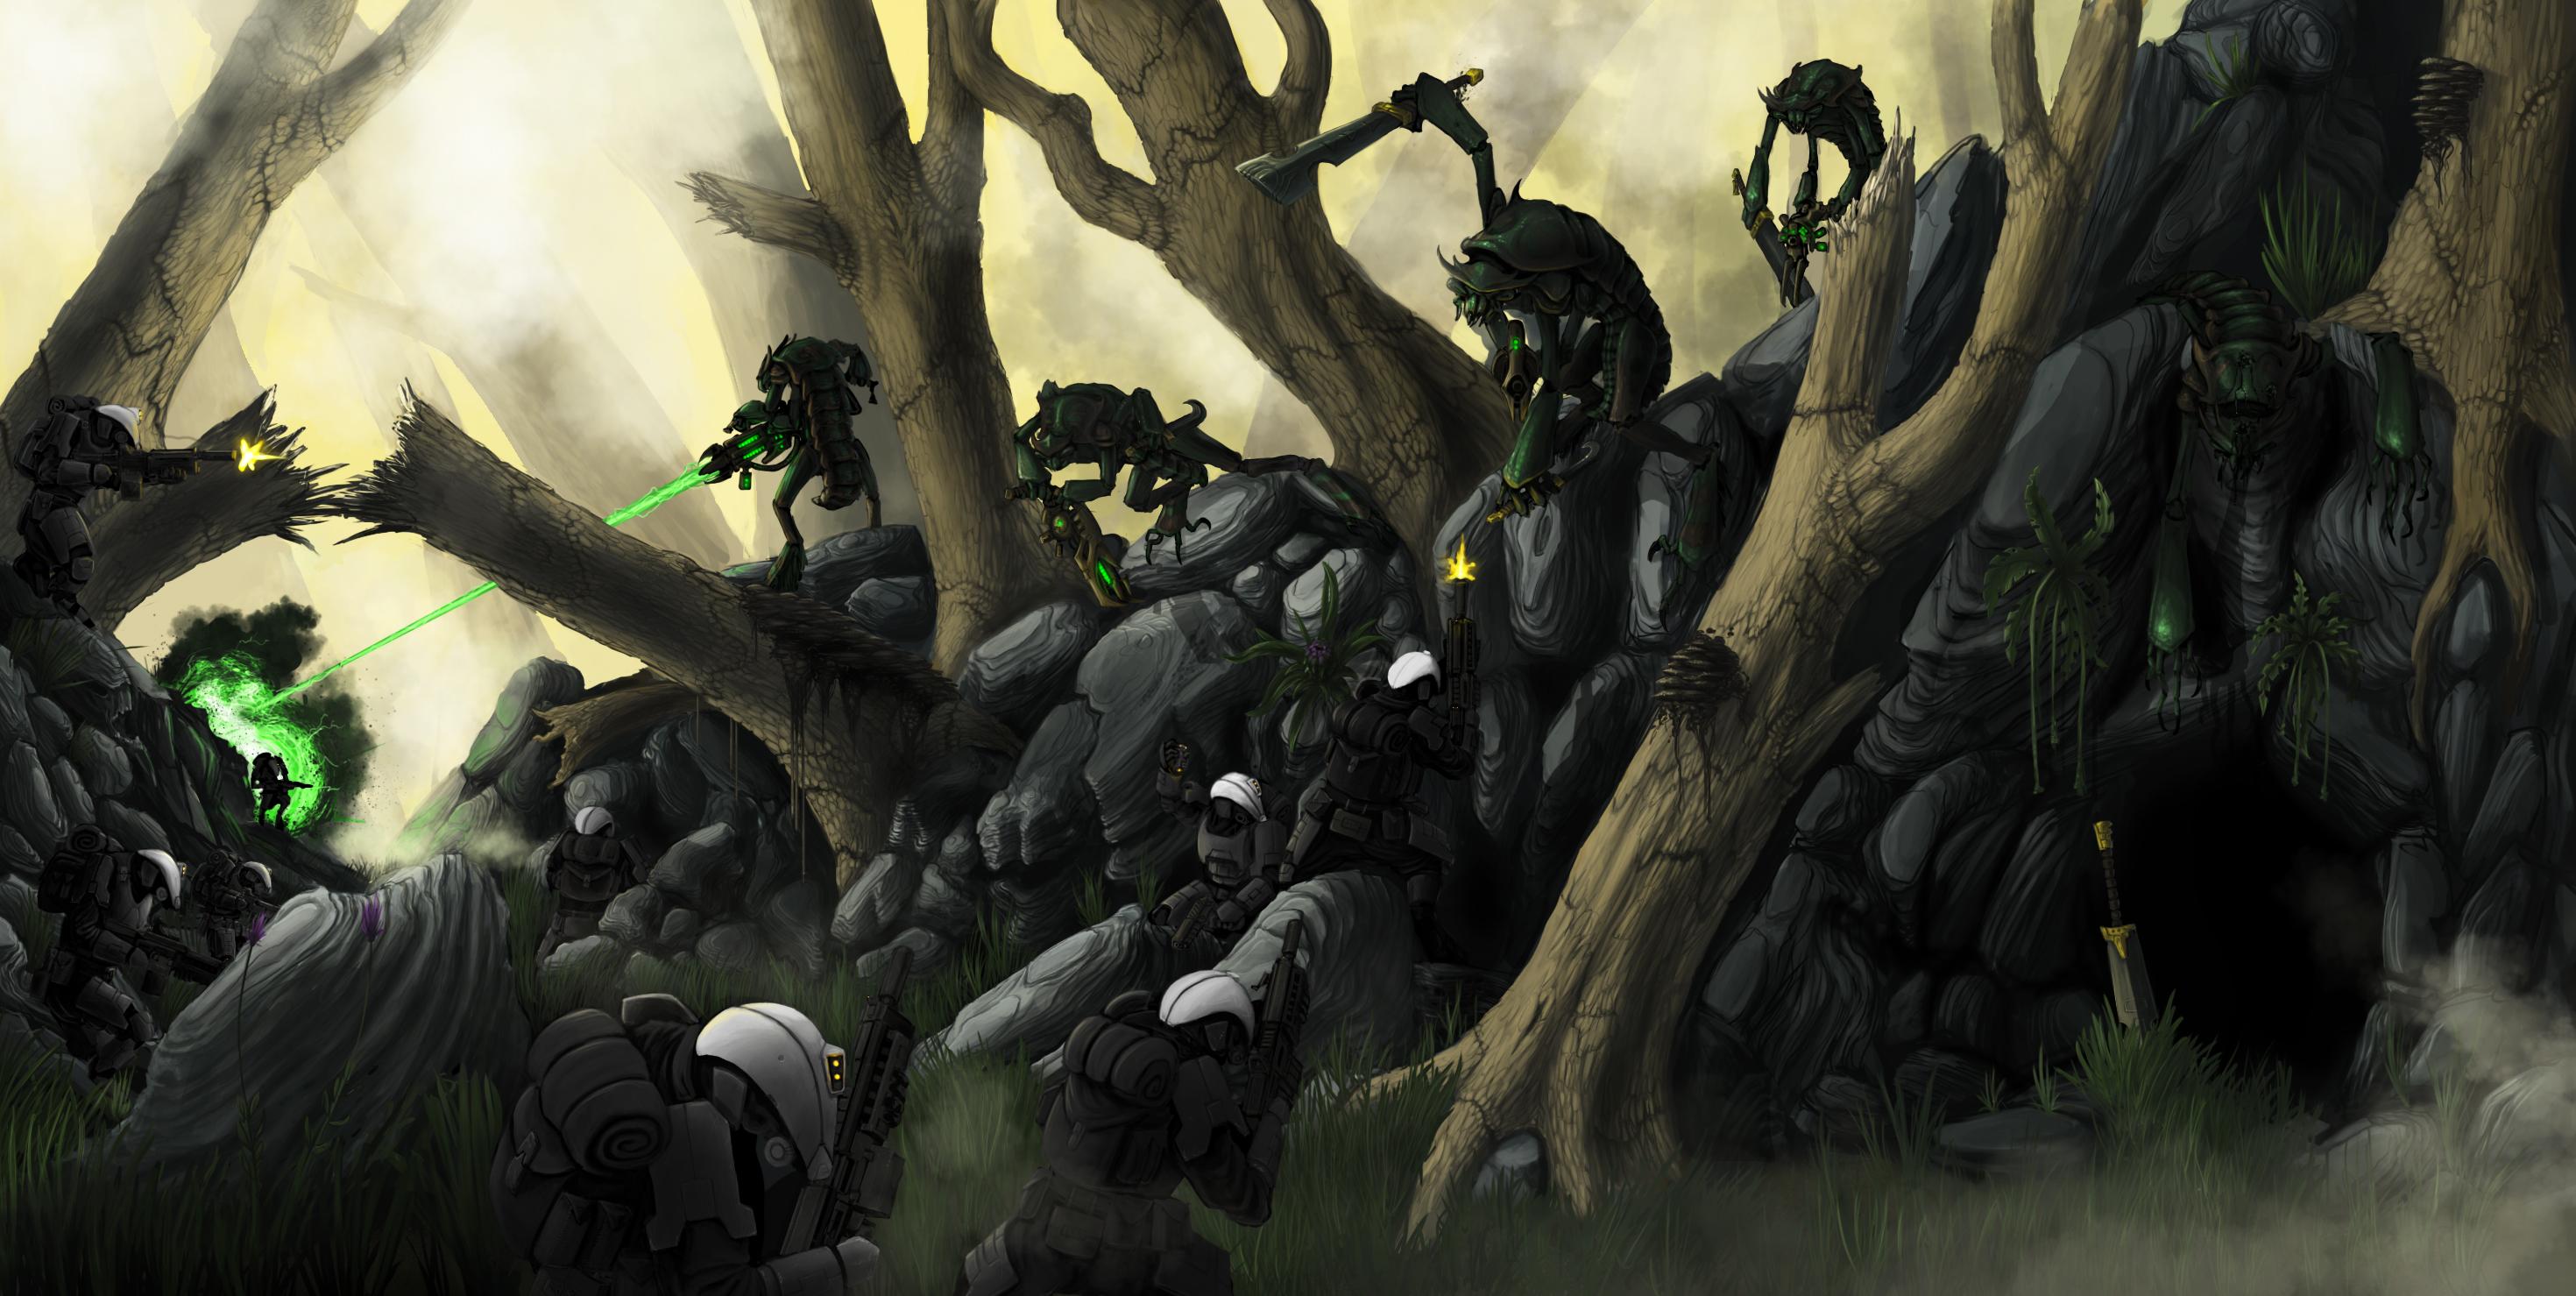 Battle for Illikar Valley by corndoggy